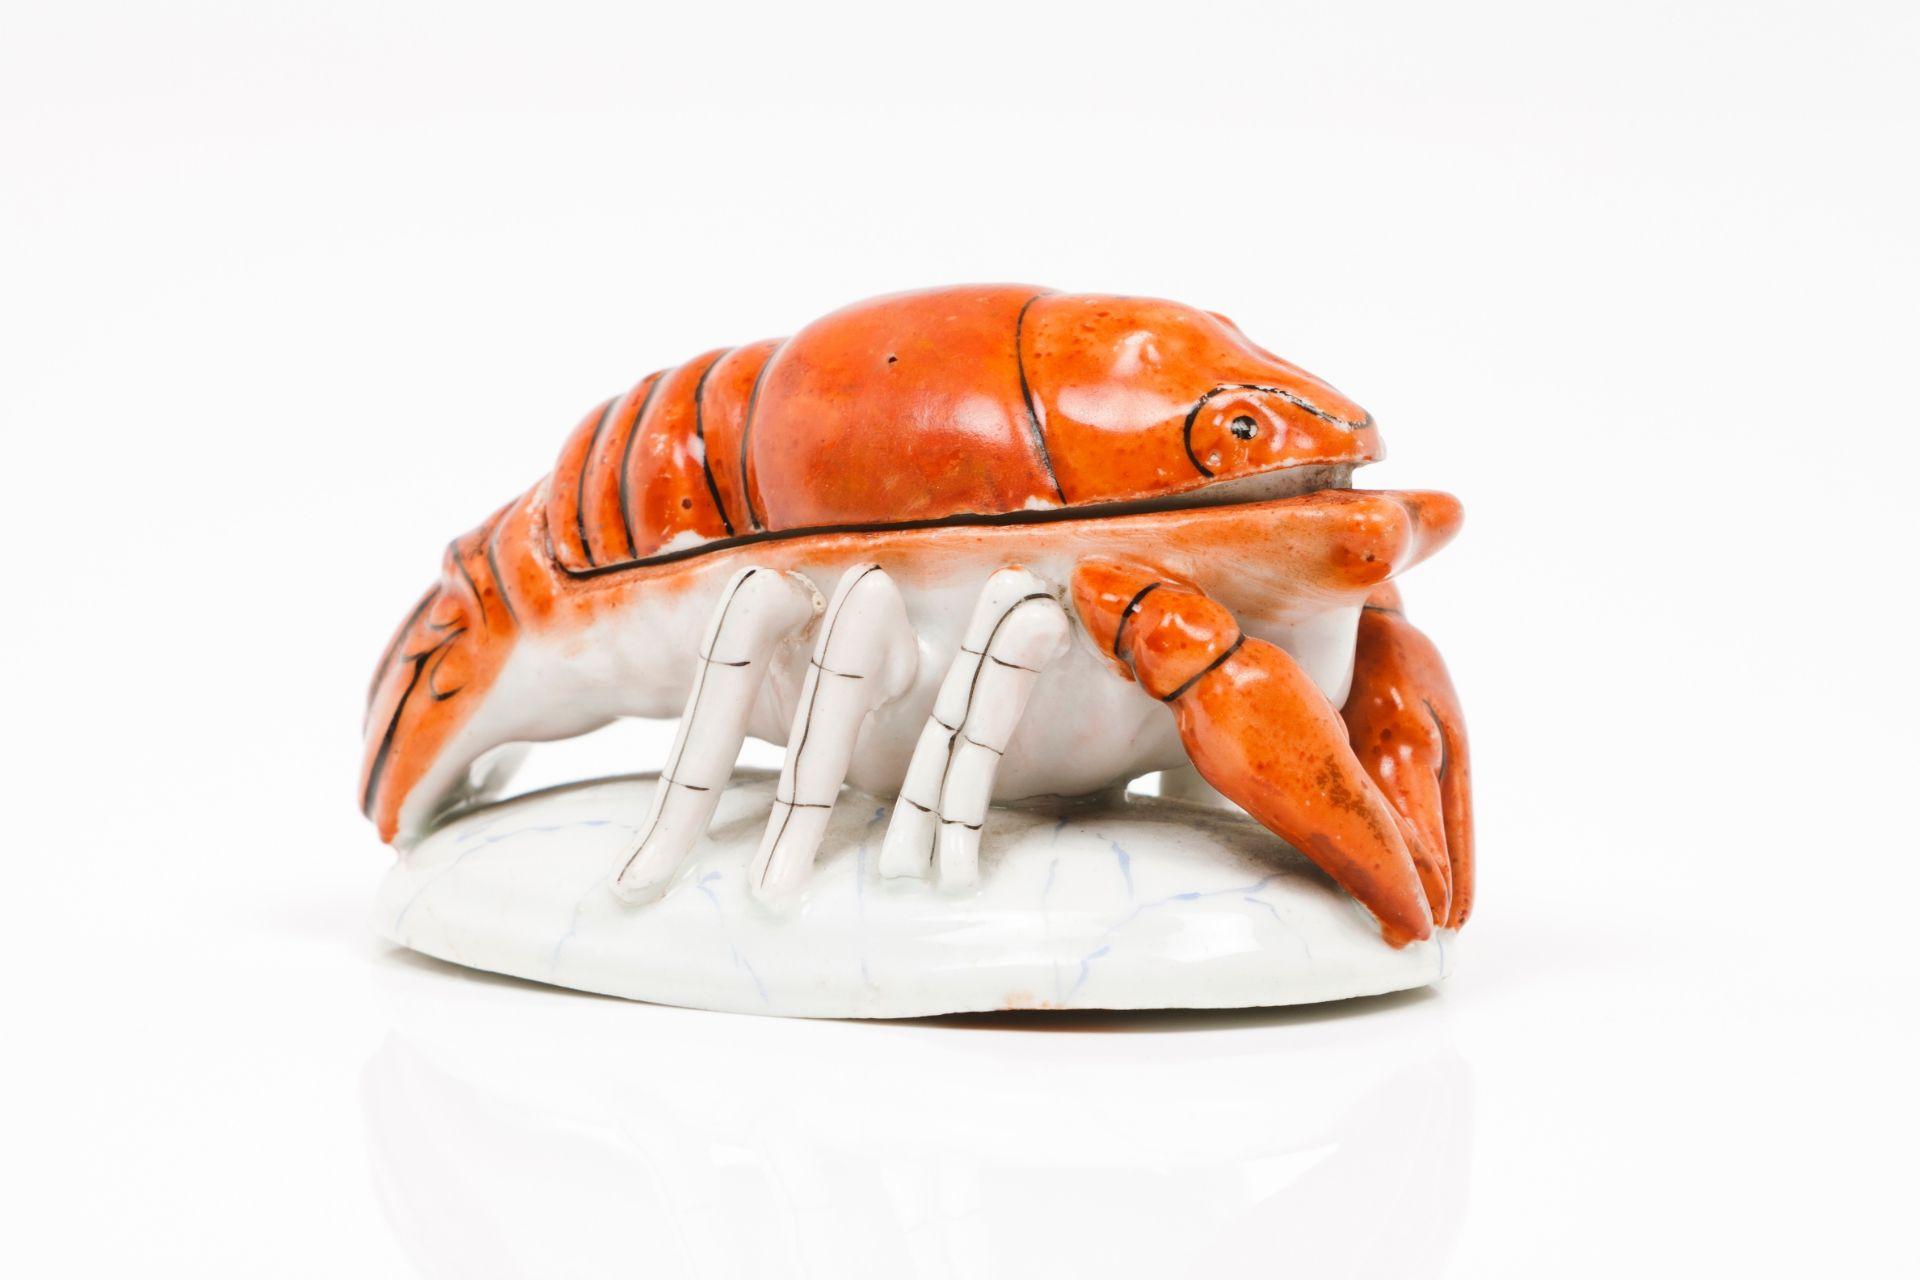 A lobster box